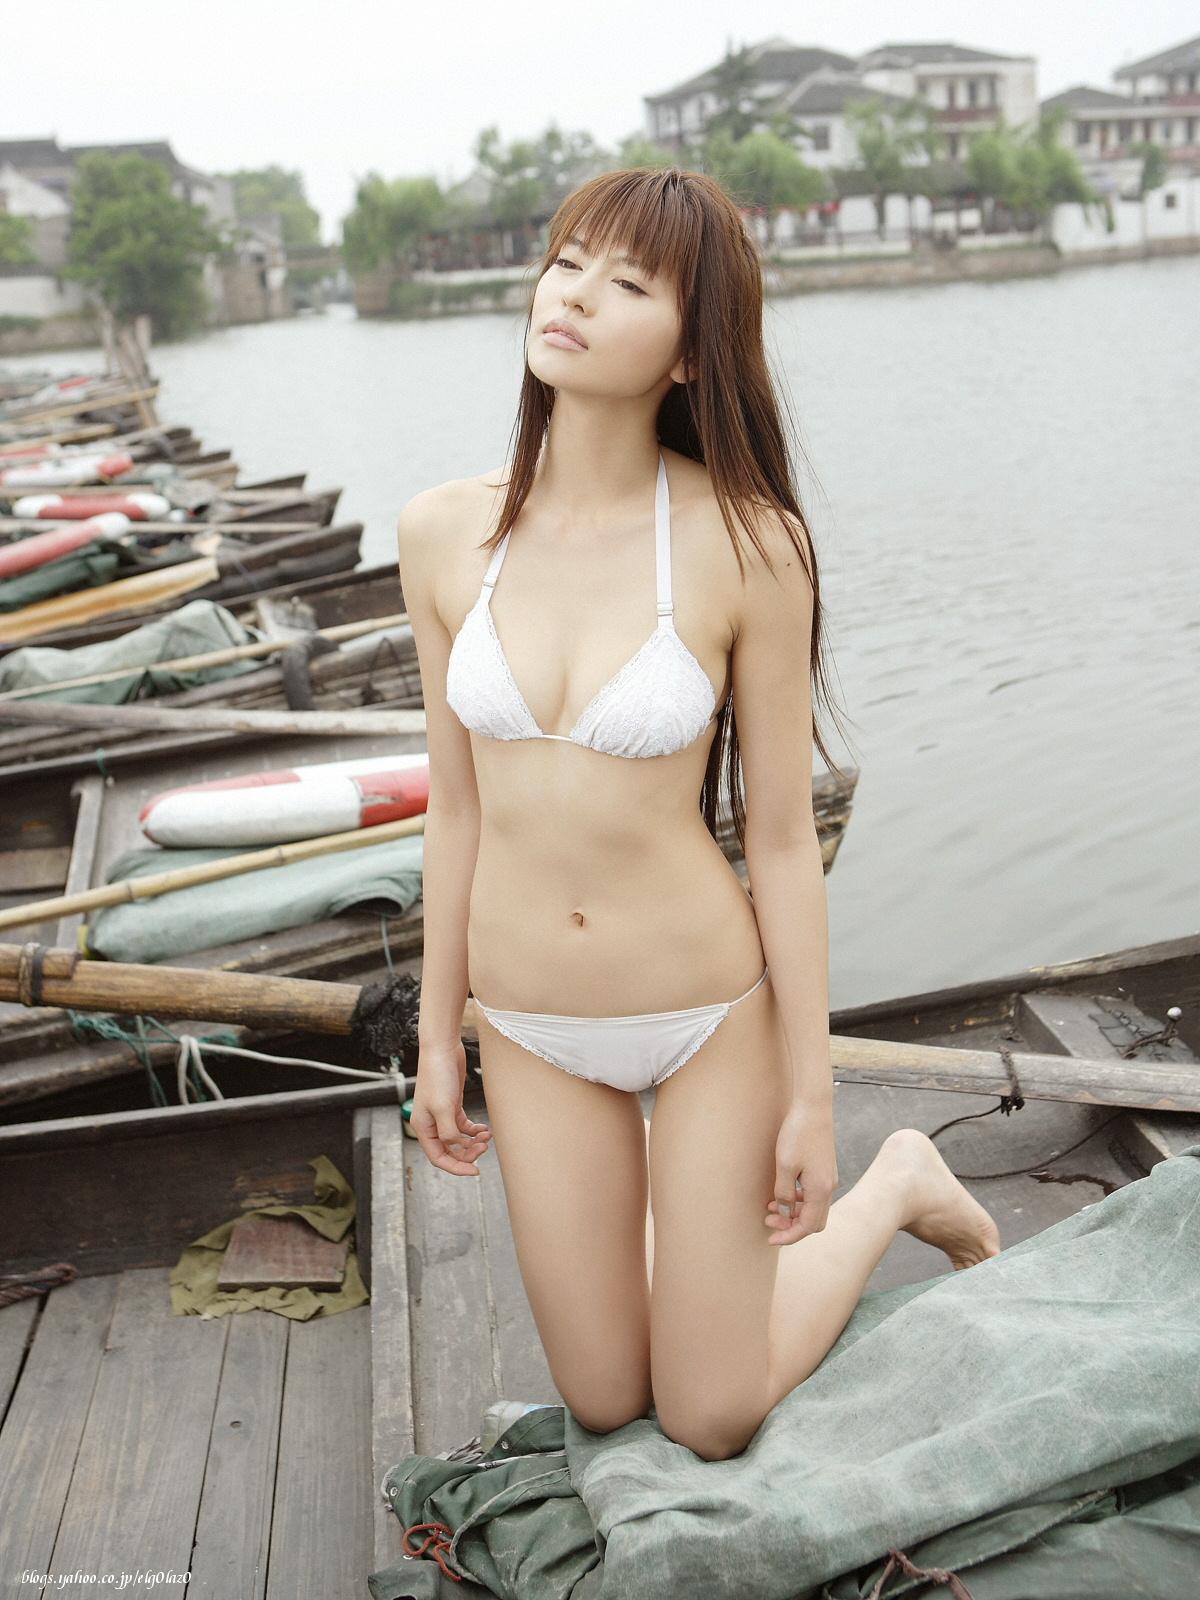 http://blog.cnobi.jp/v1/blog/user/a8c5c06266ed65ea9b67299e90592fa7/1327353871